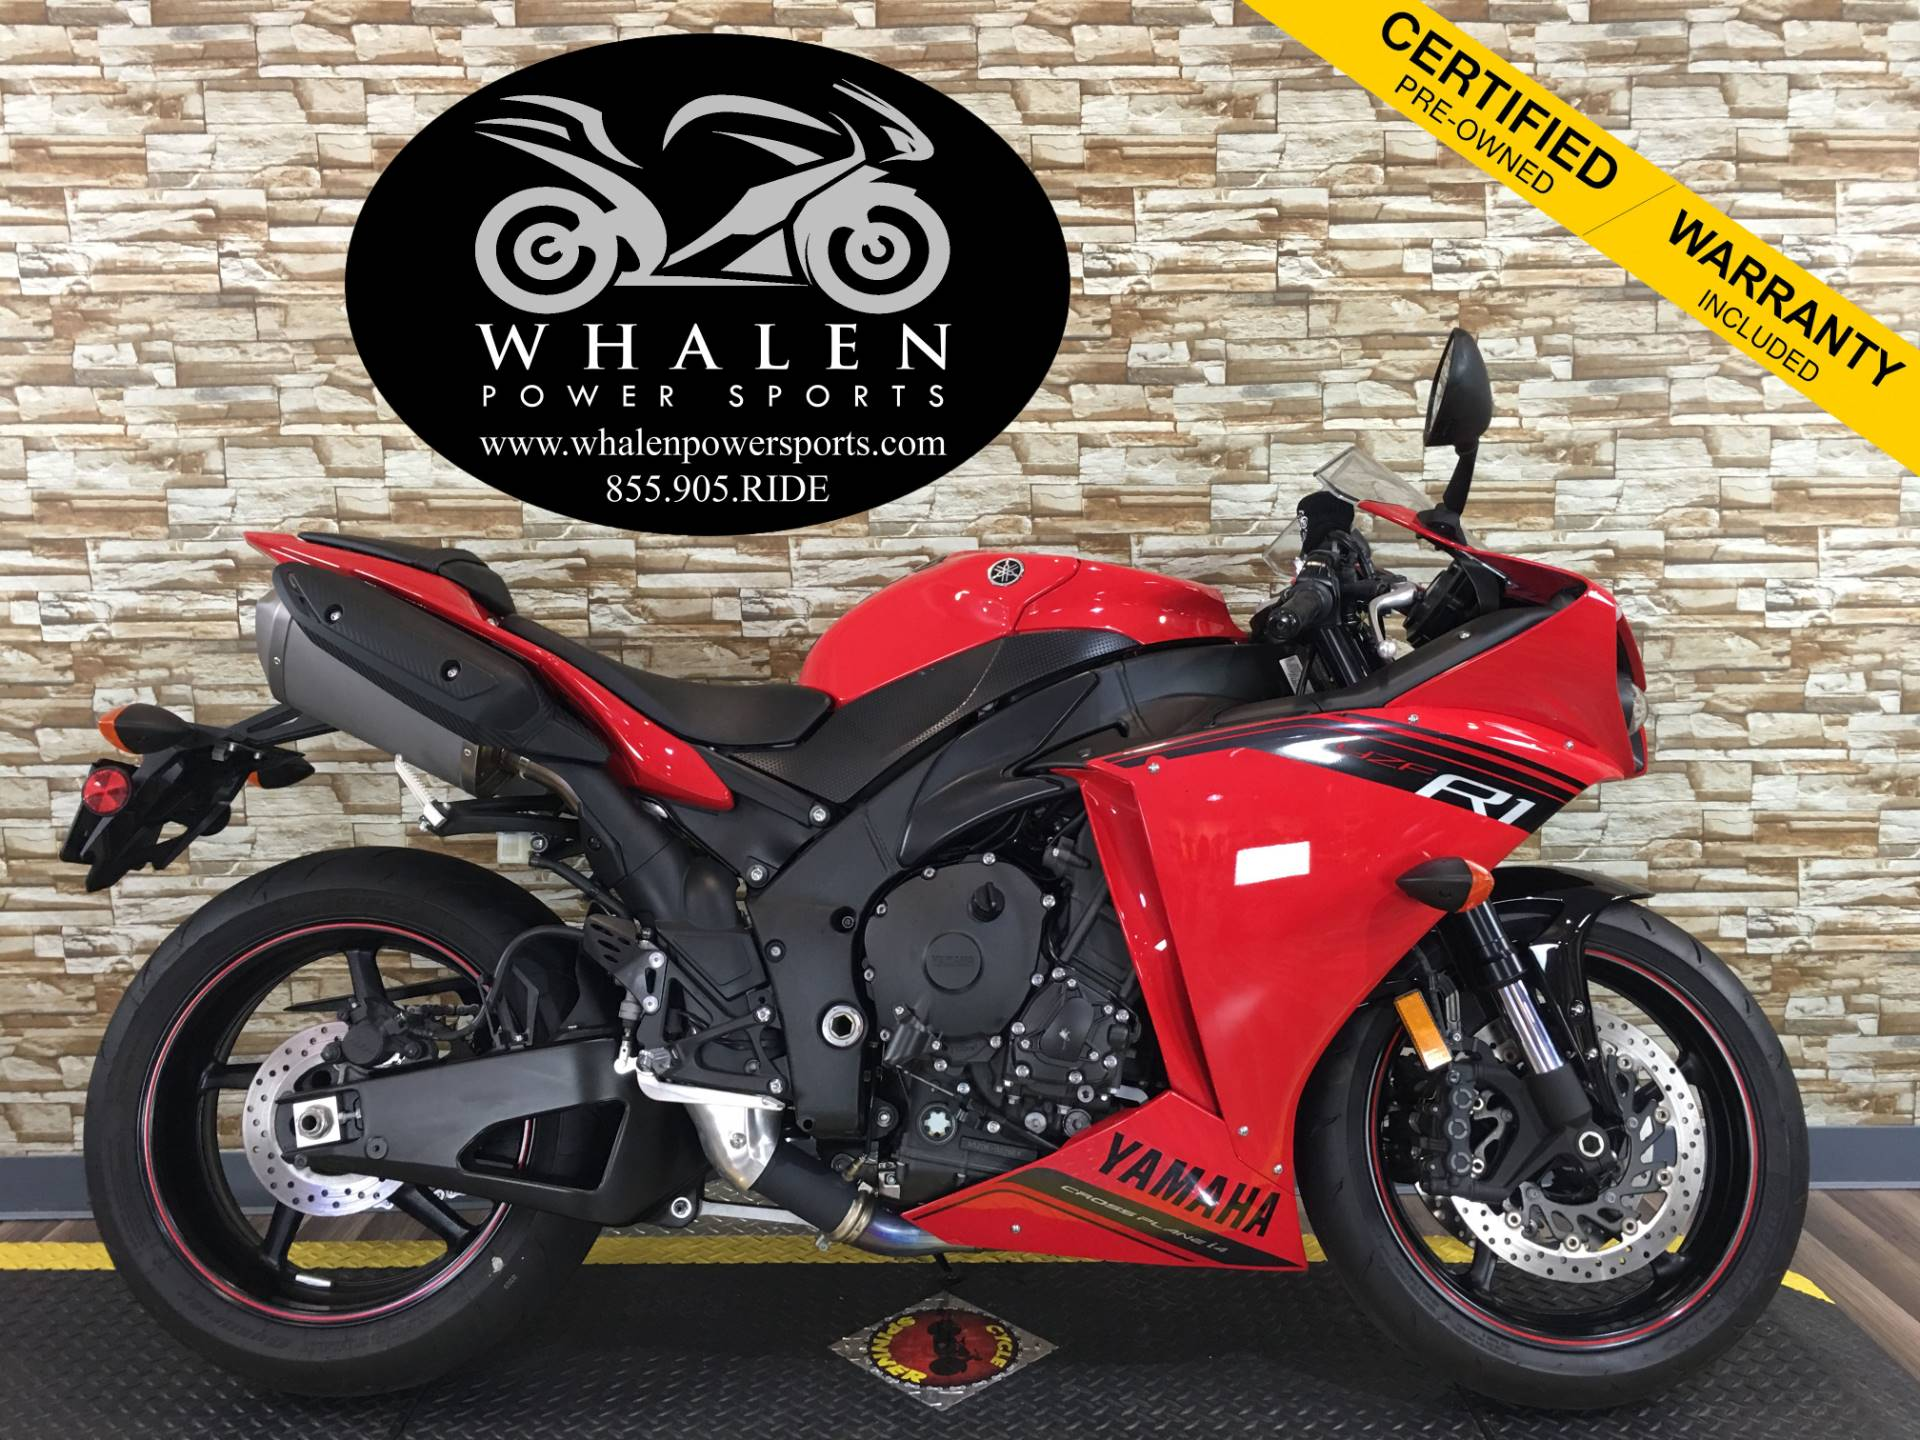 2014 Yamaha YZF-R1 1